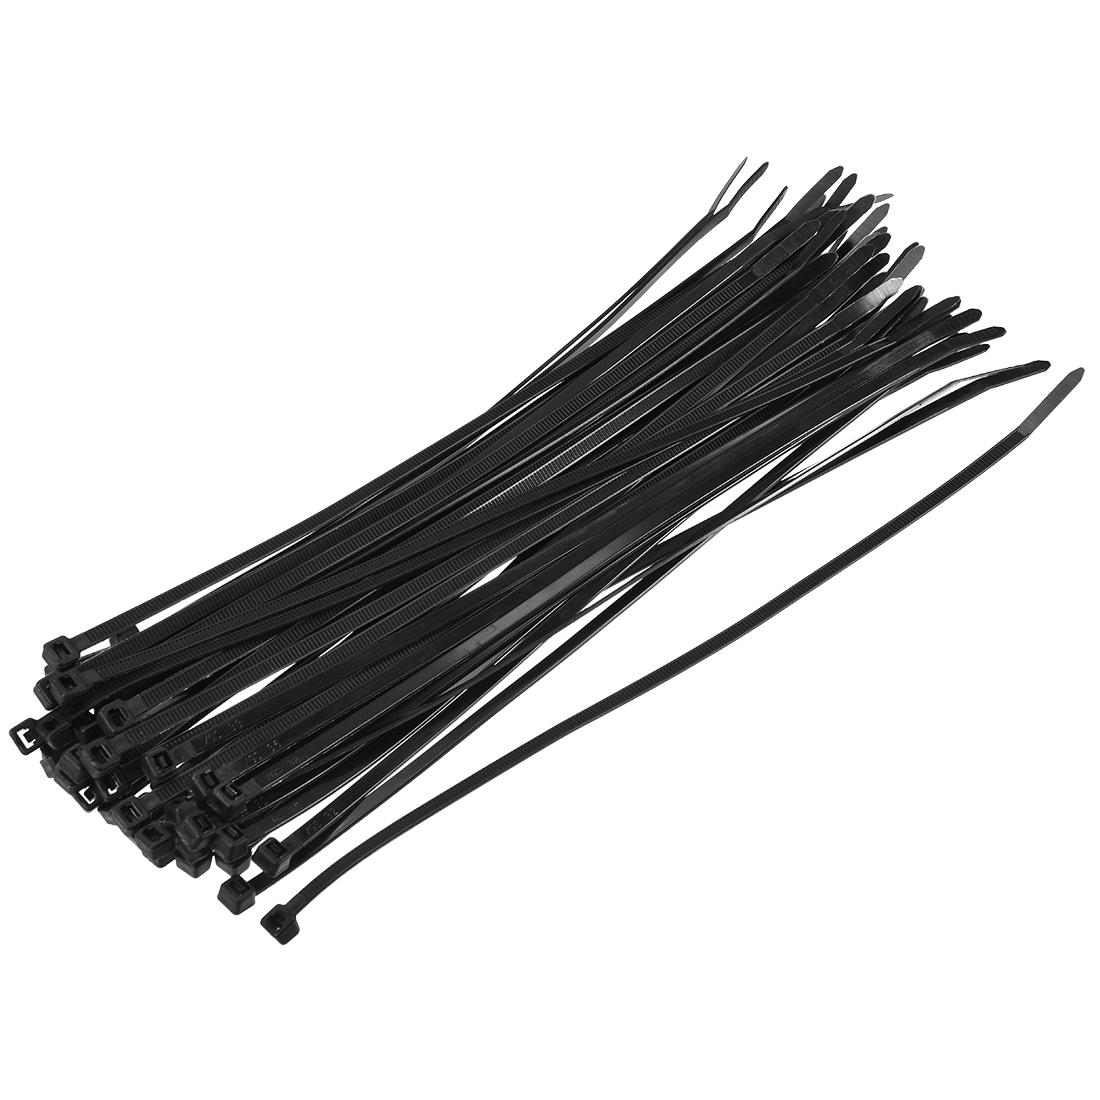 Cable Zip Ties 200mmx3.6mm Self-Locking Nylon Tie Wraps Black 150pcs